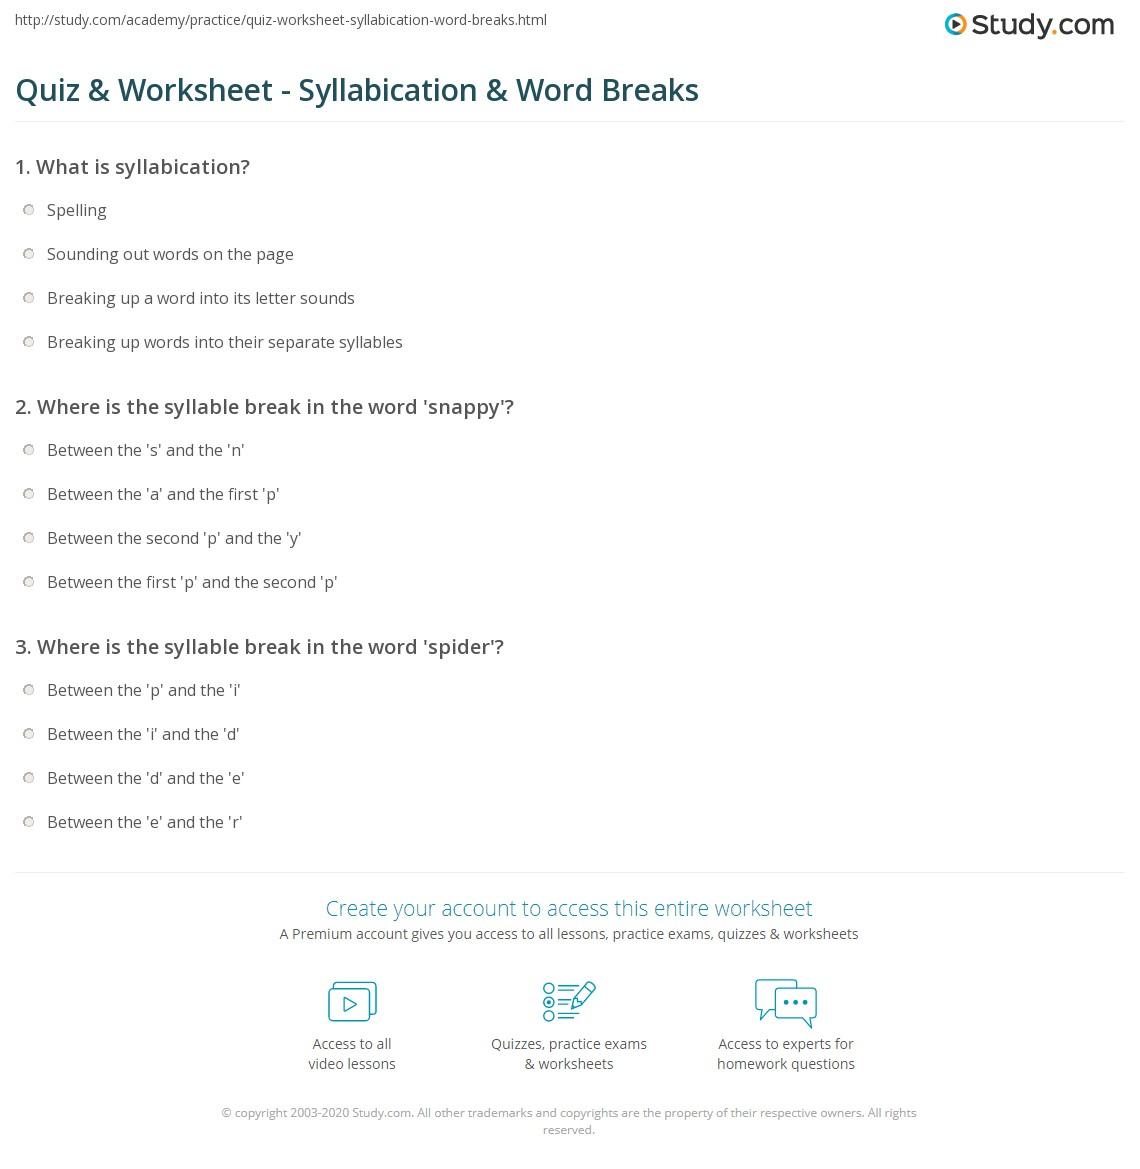 hight resolution of Quiz \u0026 Worksheet - Syllabication \u0026 Word Breaks   Study.com